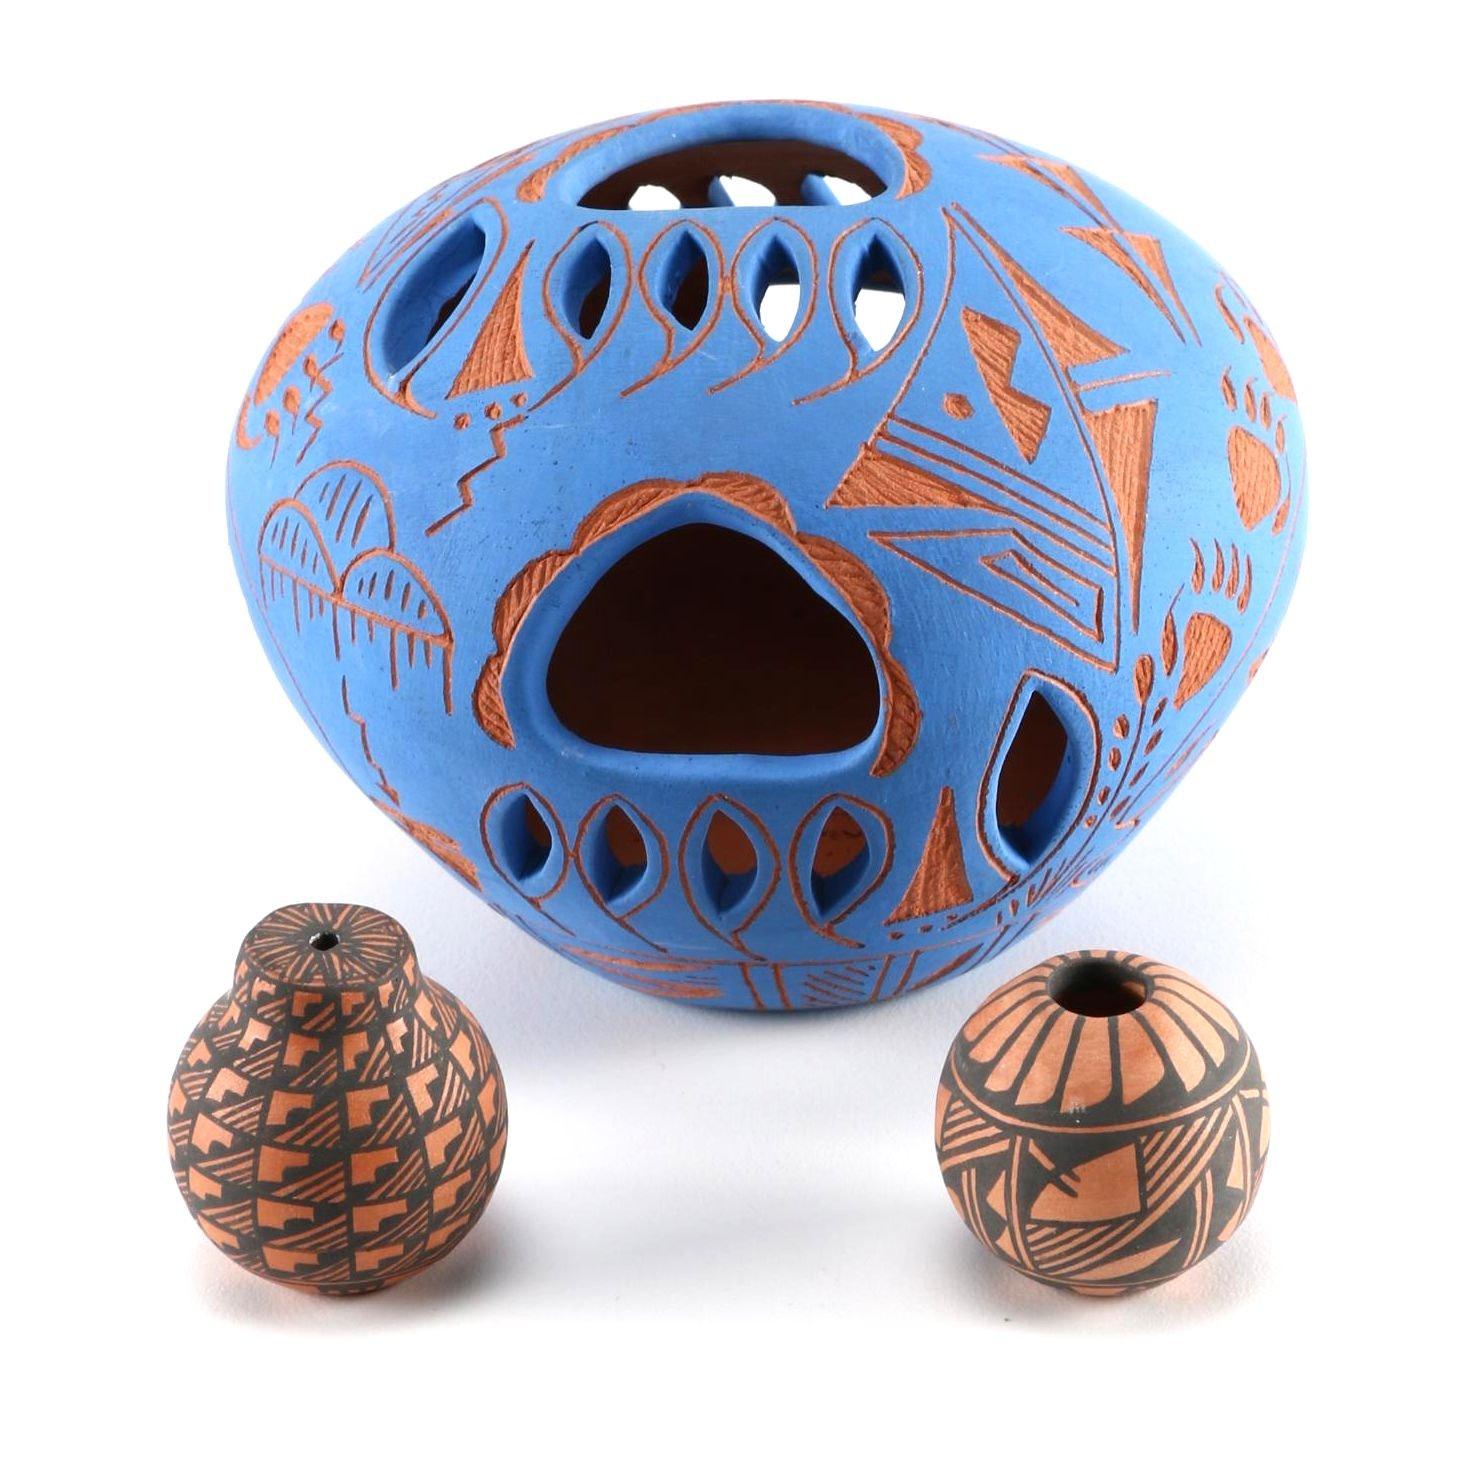 Pueblo Style Pottery by Susan Sarracino and J.S Lewis